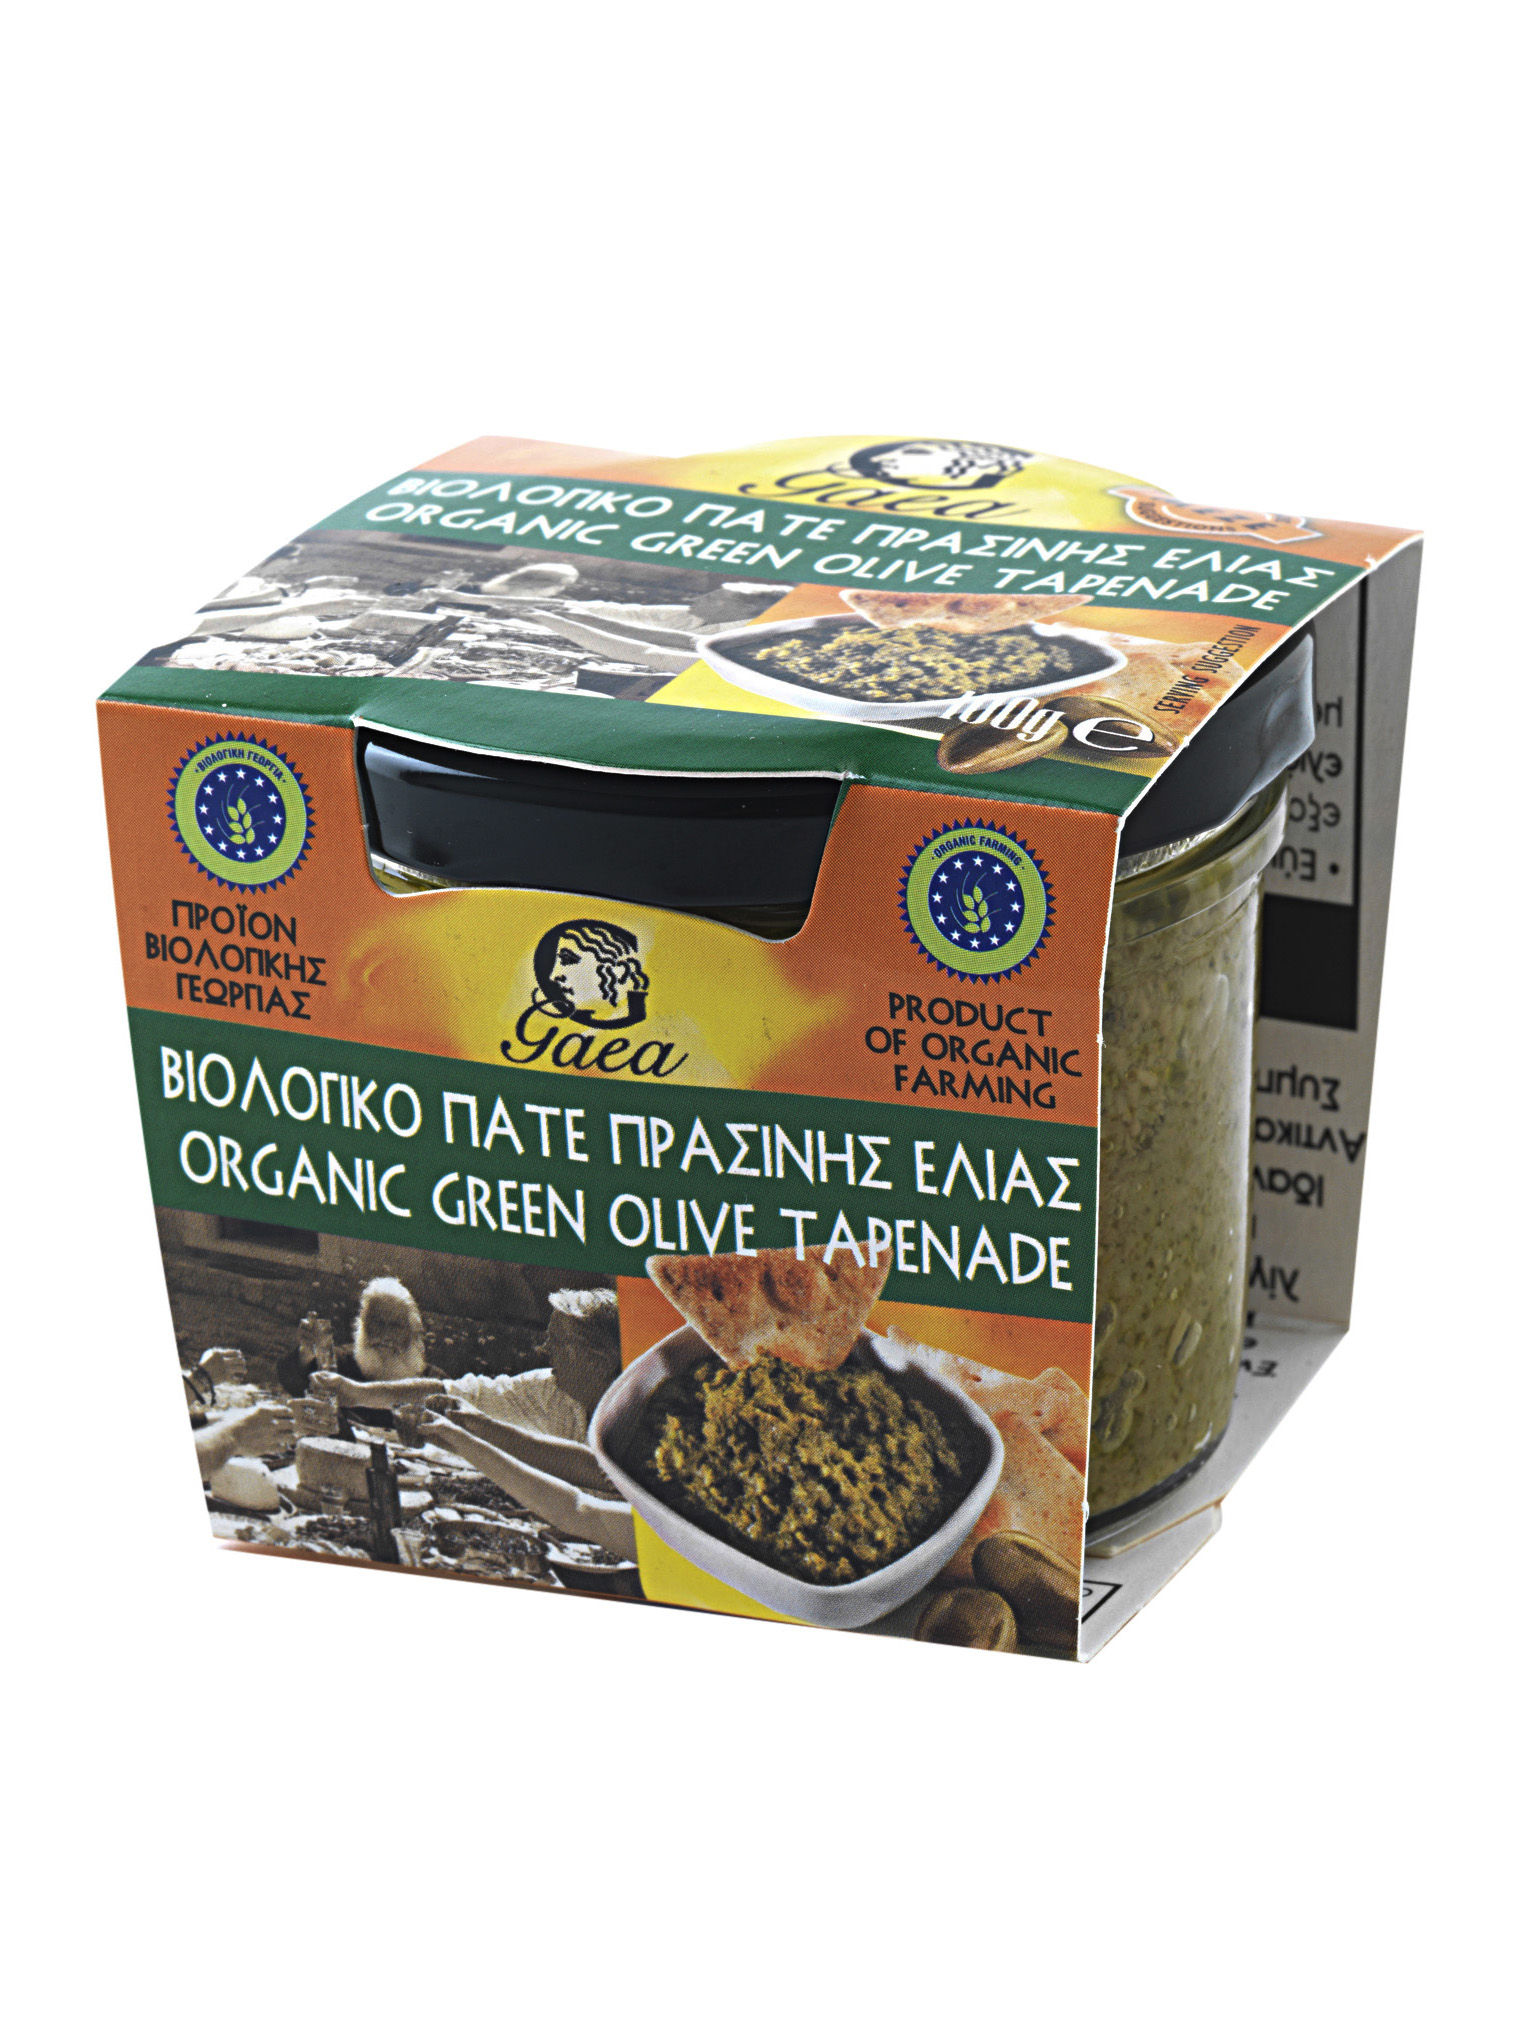 pasta organic greenolive